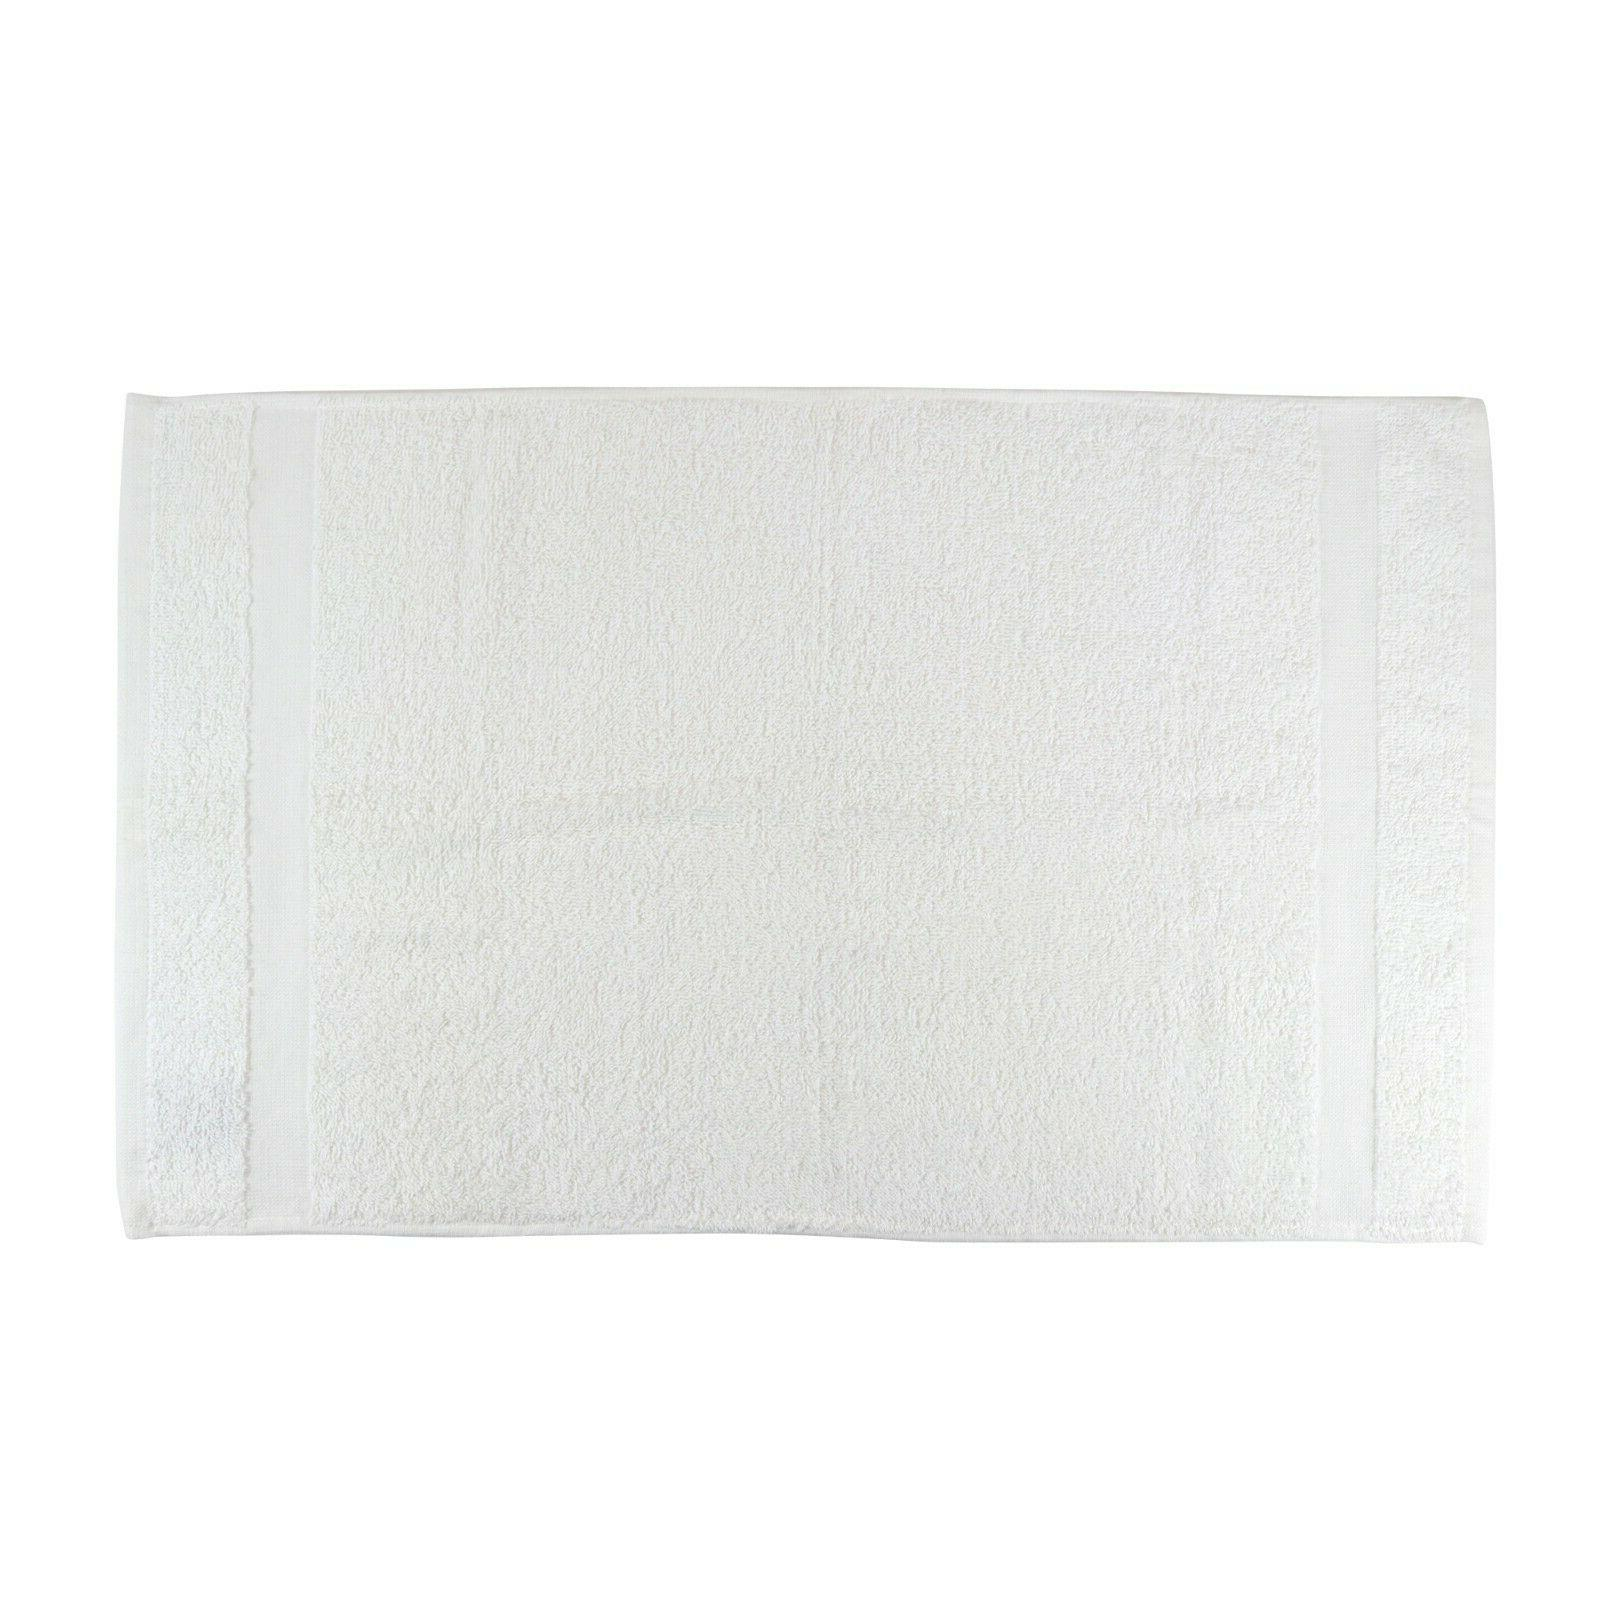 12 Admiral Hand - White - - Bulk Bathroom Towels